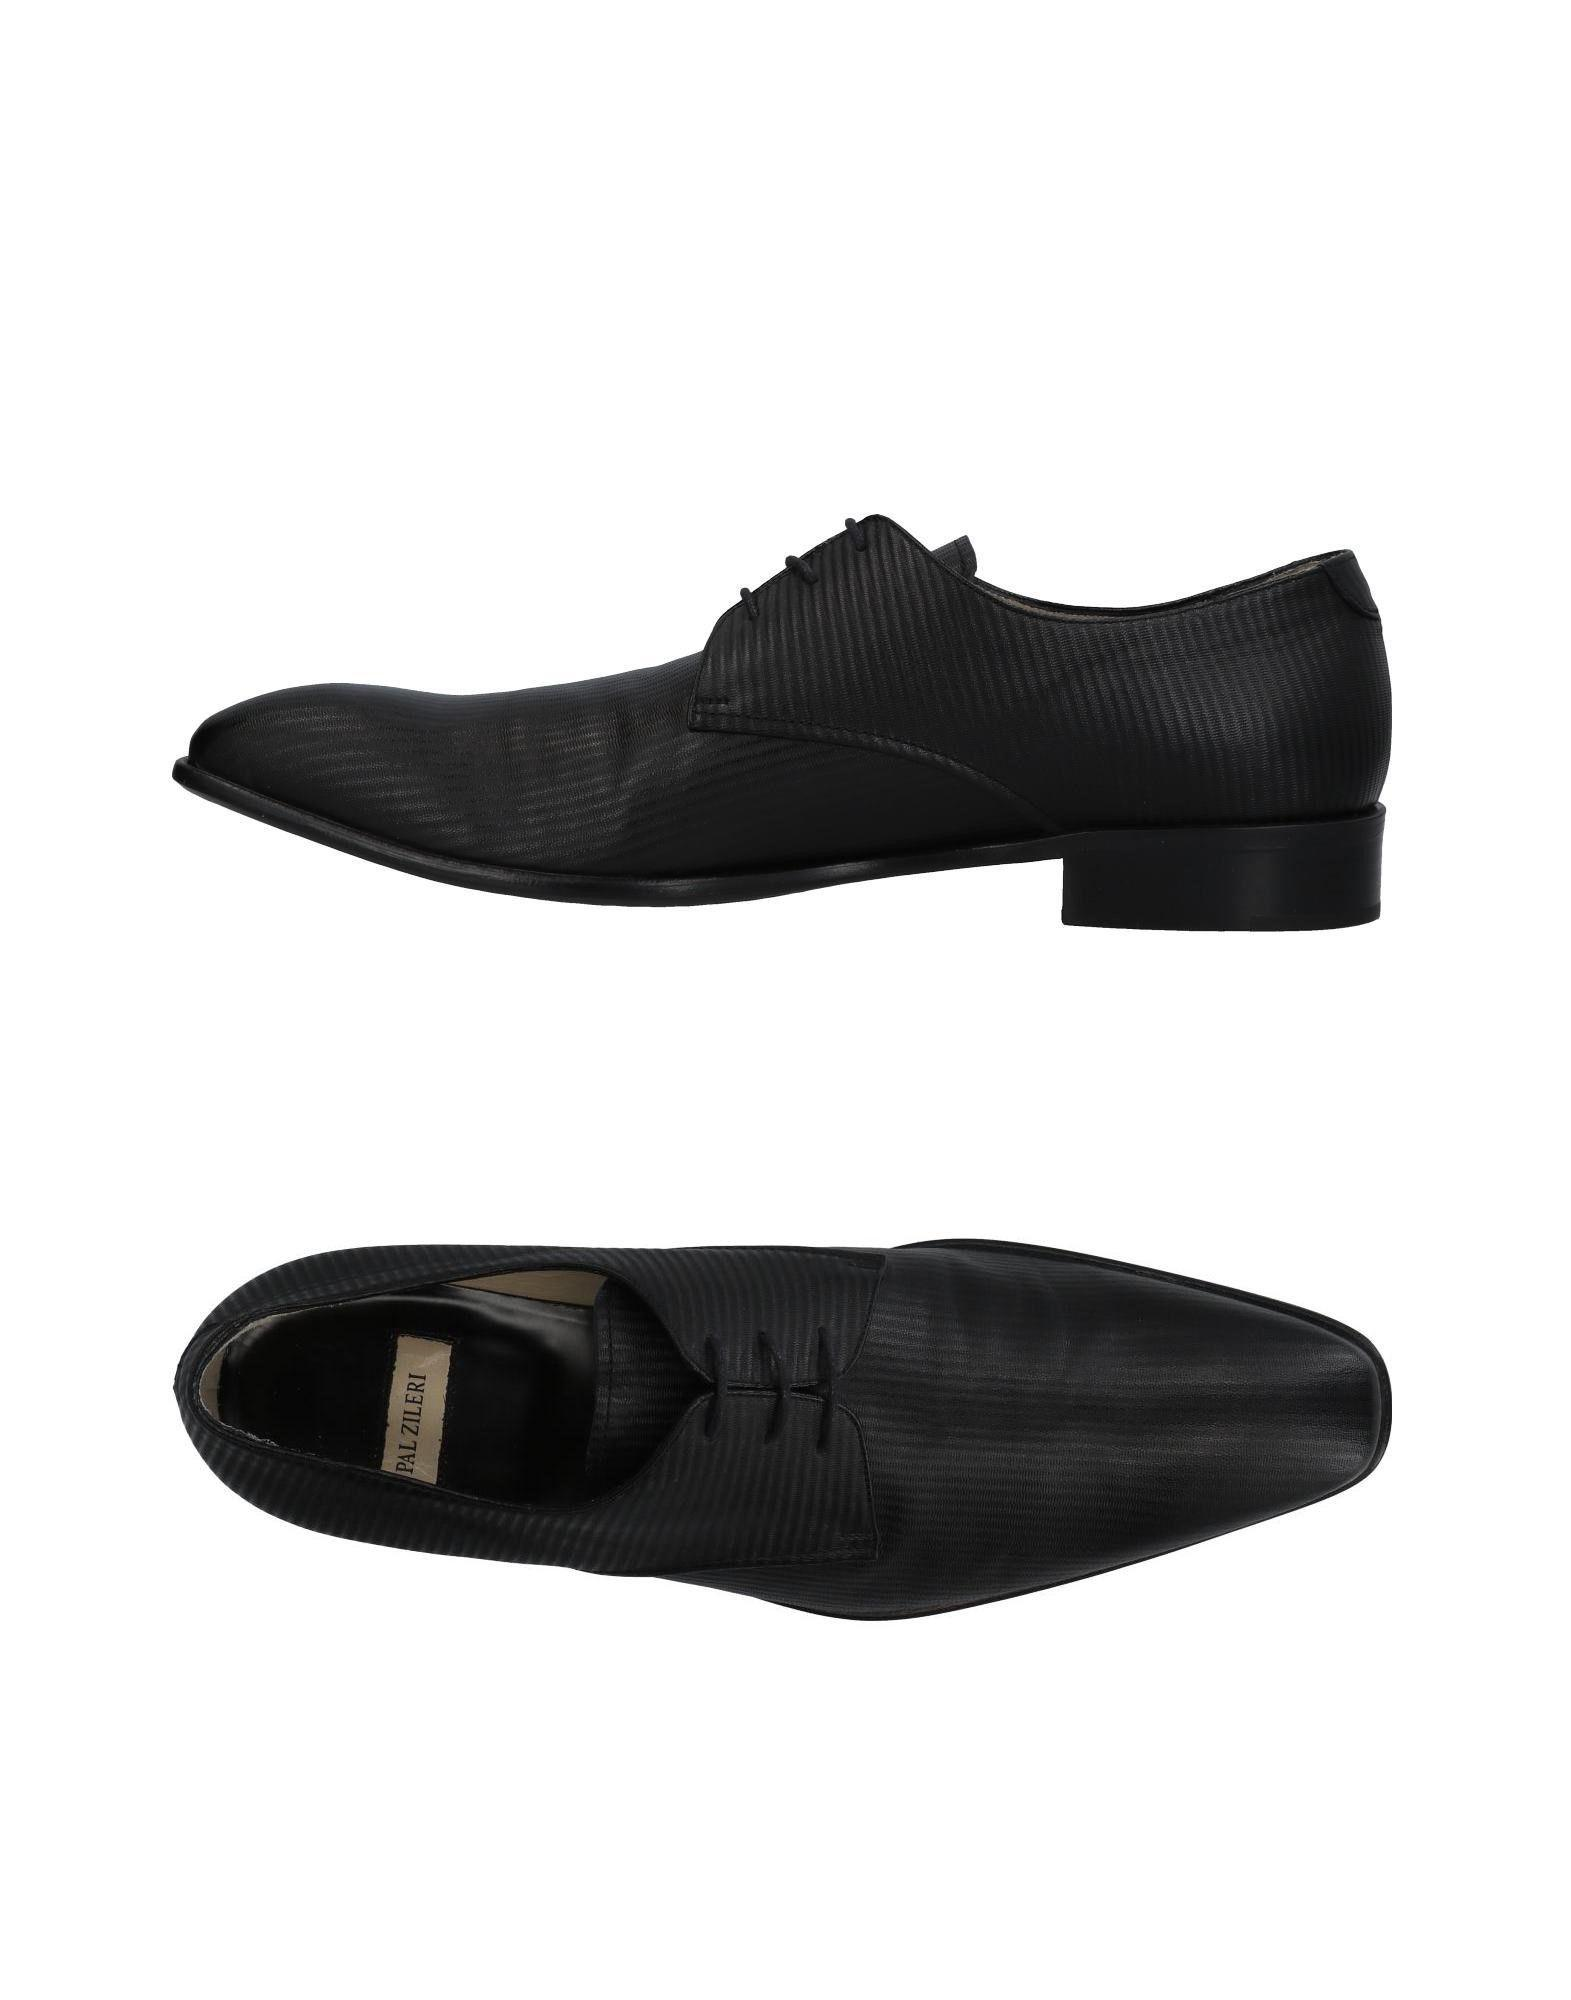 Pal Zileri Chaussures À Lacets kiE1JIkgwM